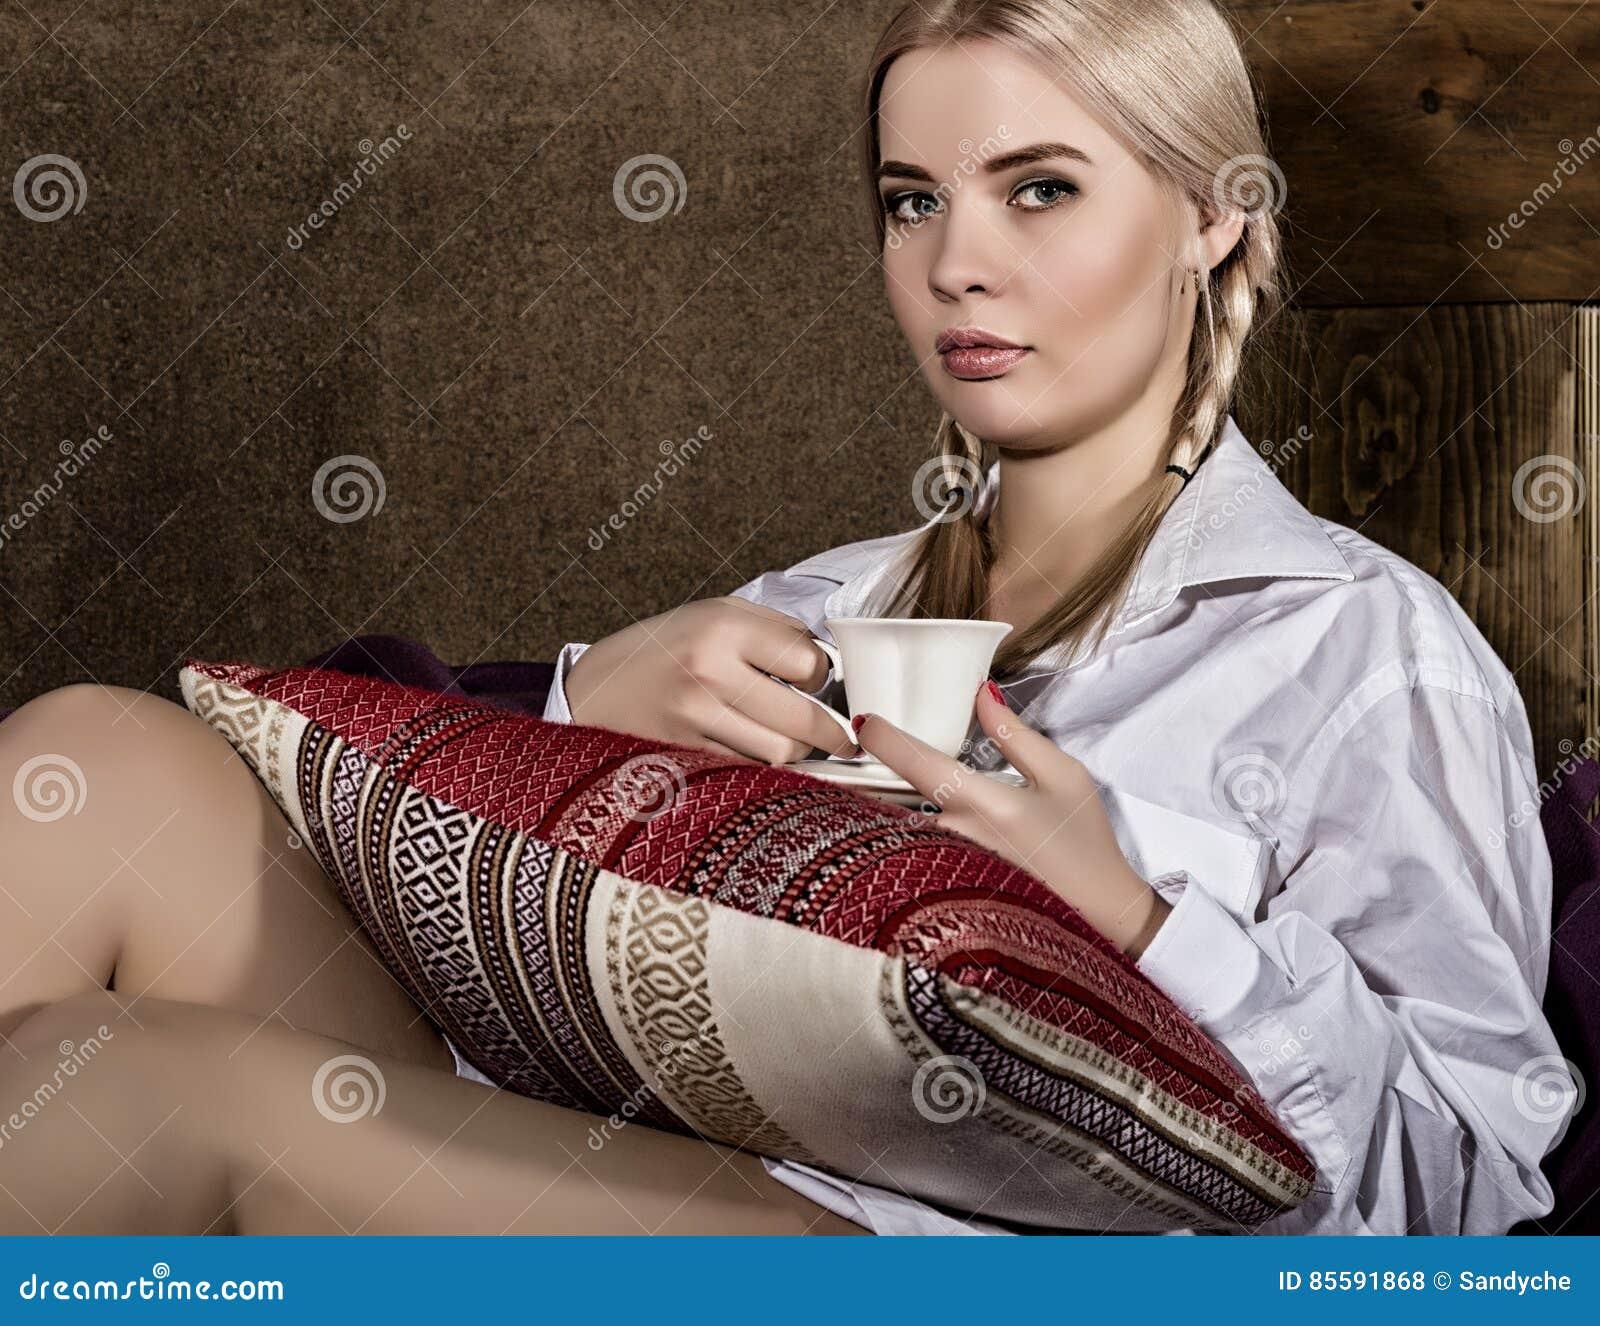 My wife in a porno